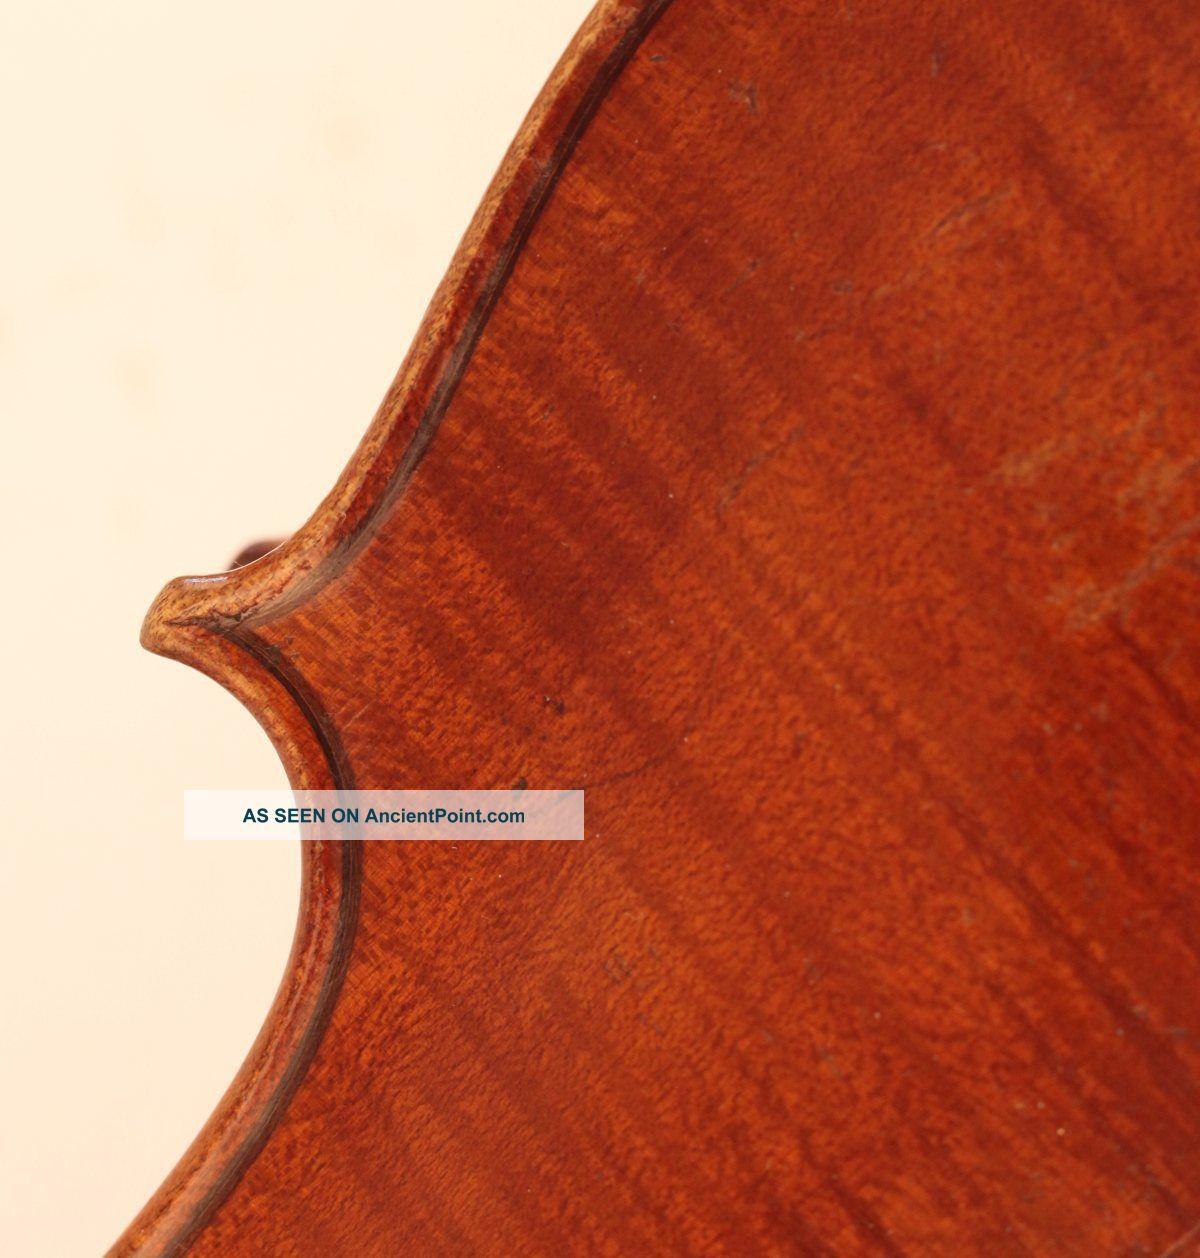 http://ancientpoint.com/imgs/a/i/z/i/r/rare_and_fine_old_italian_violin_gigli_1771_geige_violon_violine_violino_viola_1_lgw.jpg